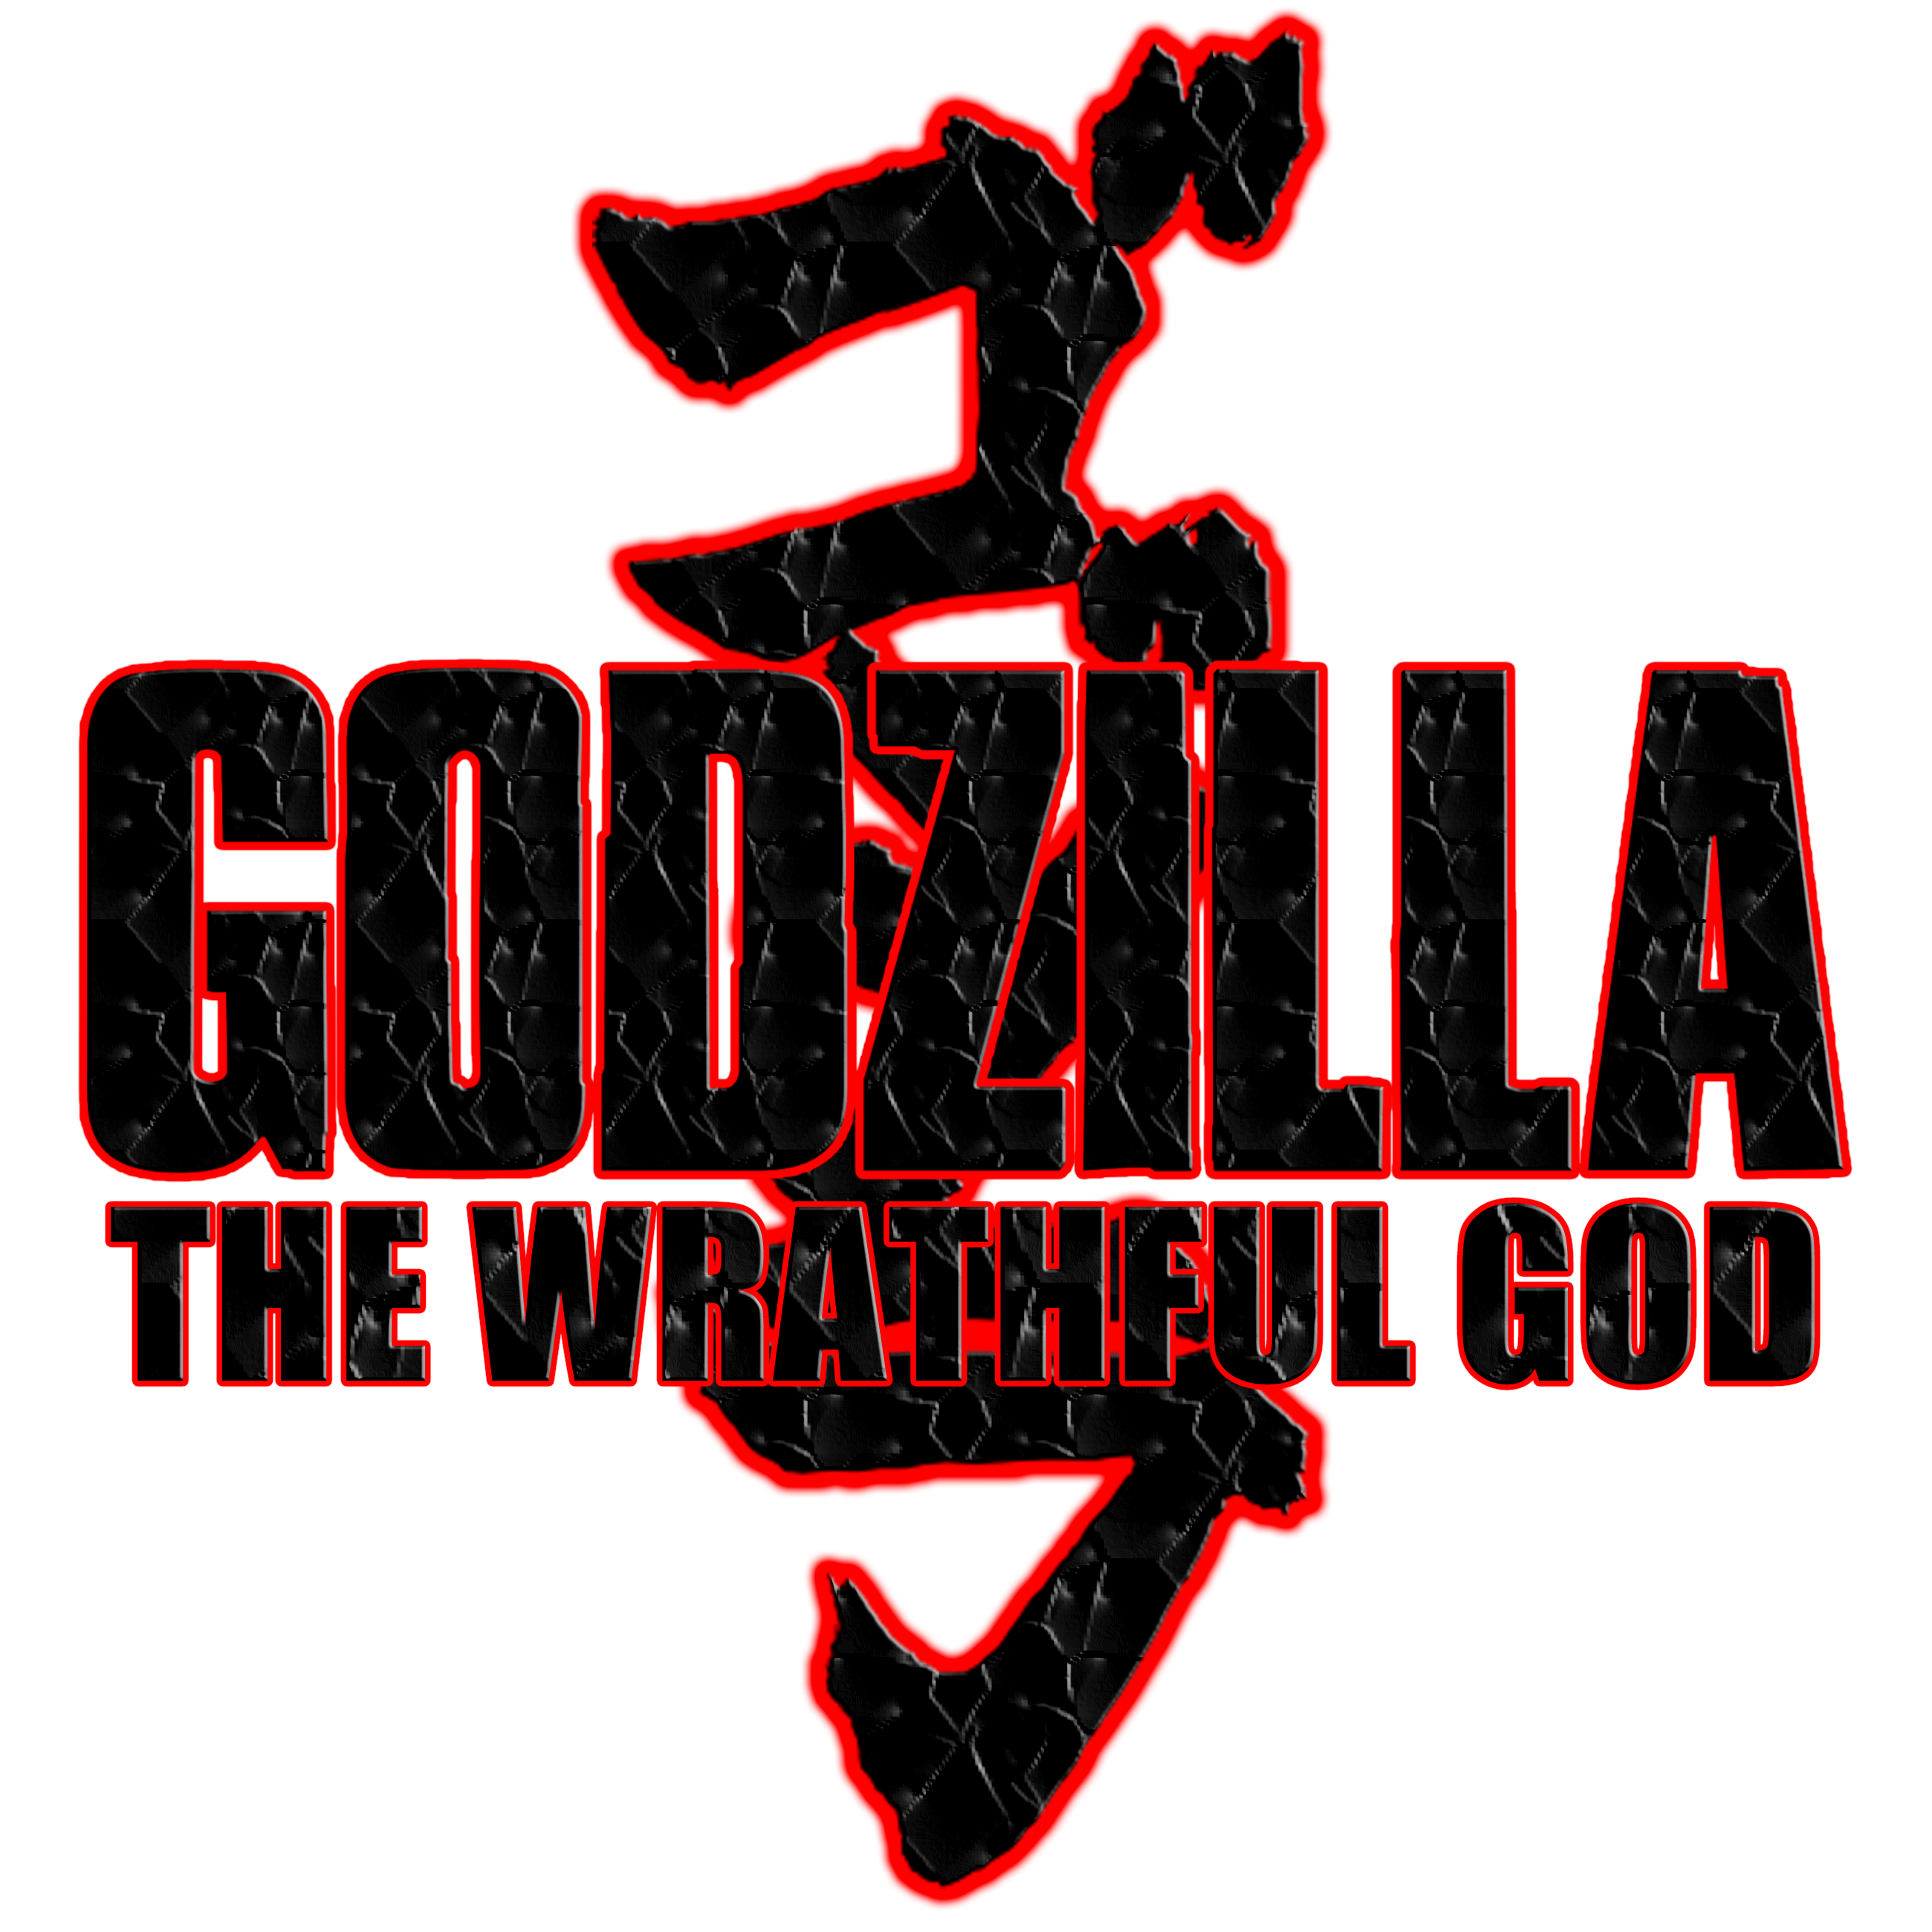 Godzilla The Wrathful God Alternative Logo